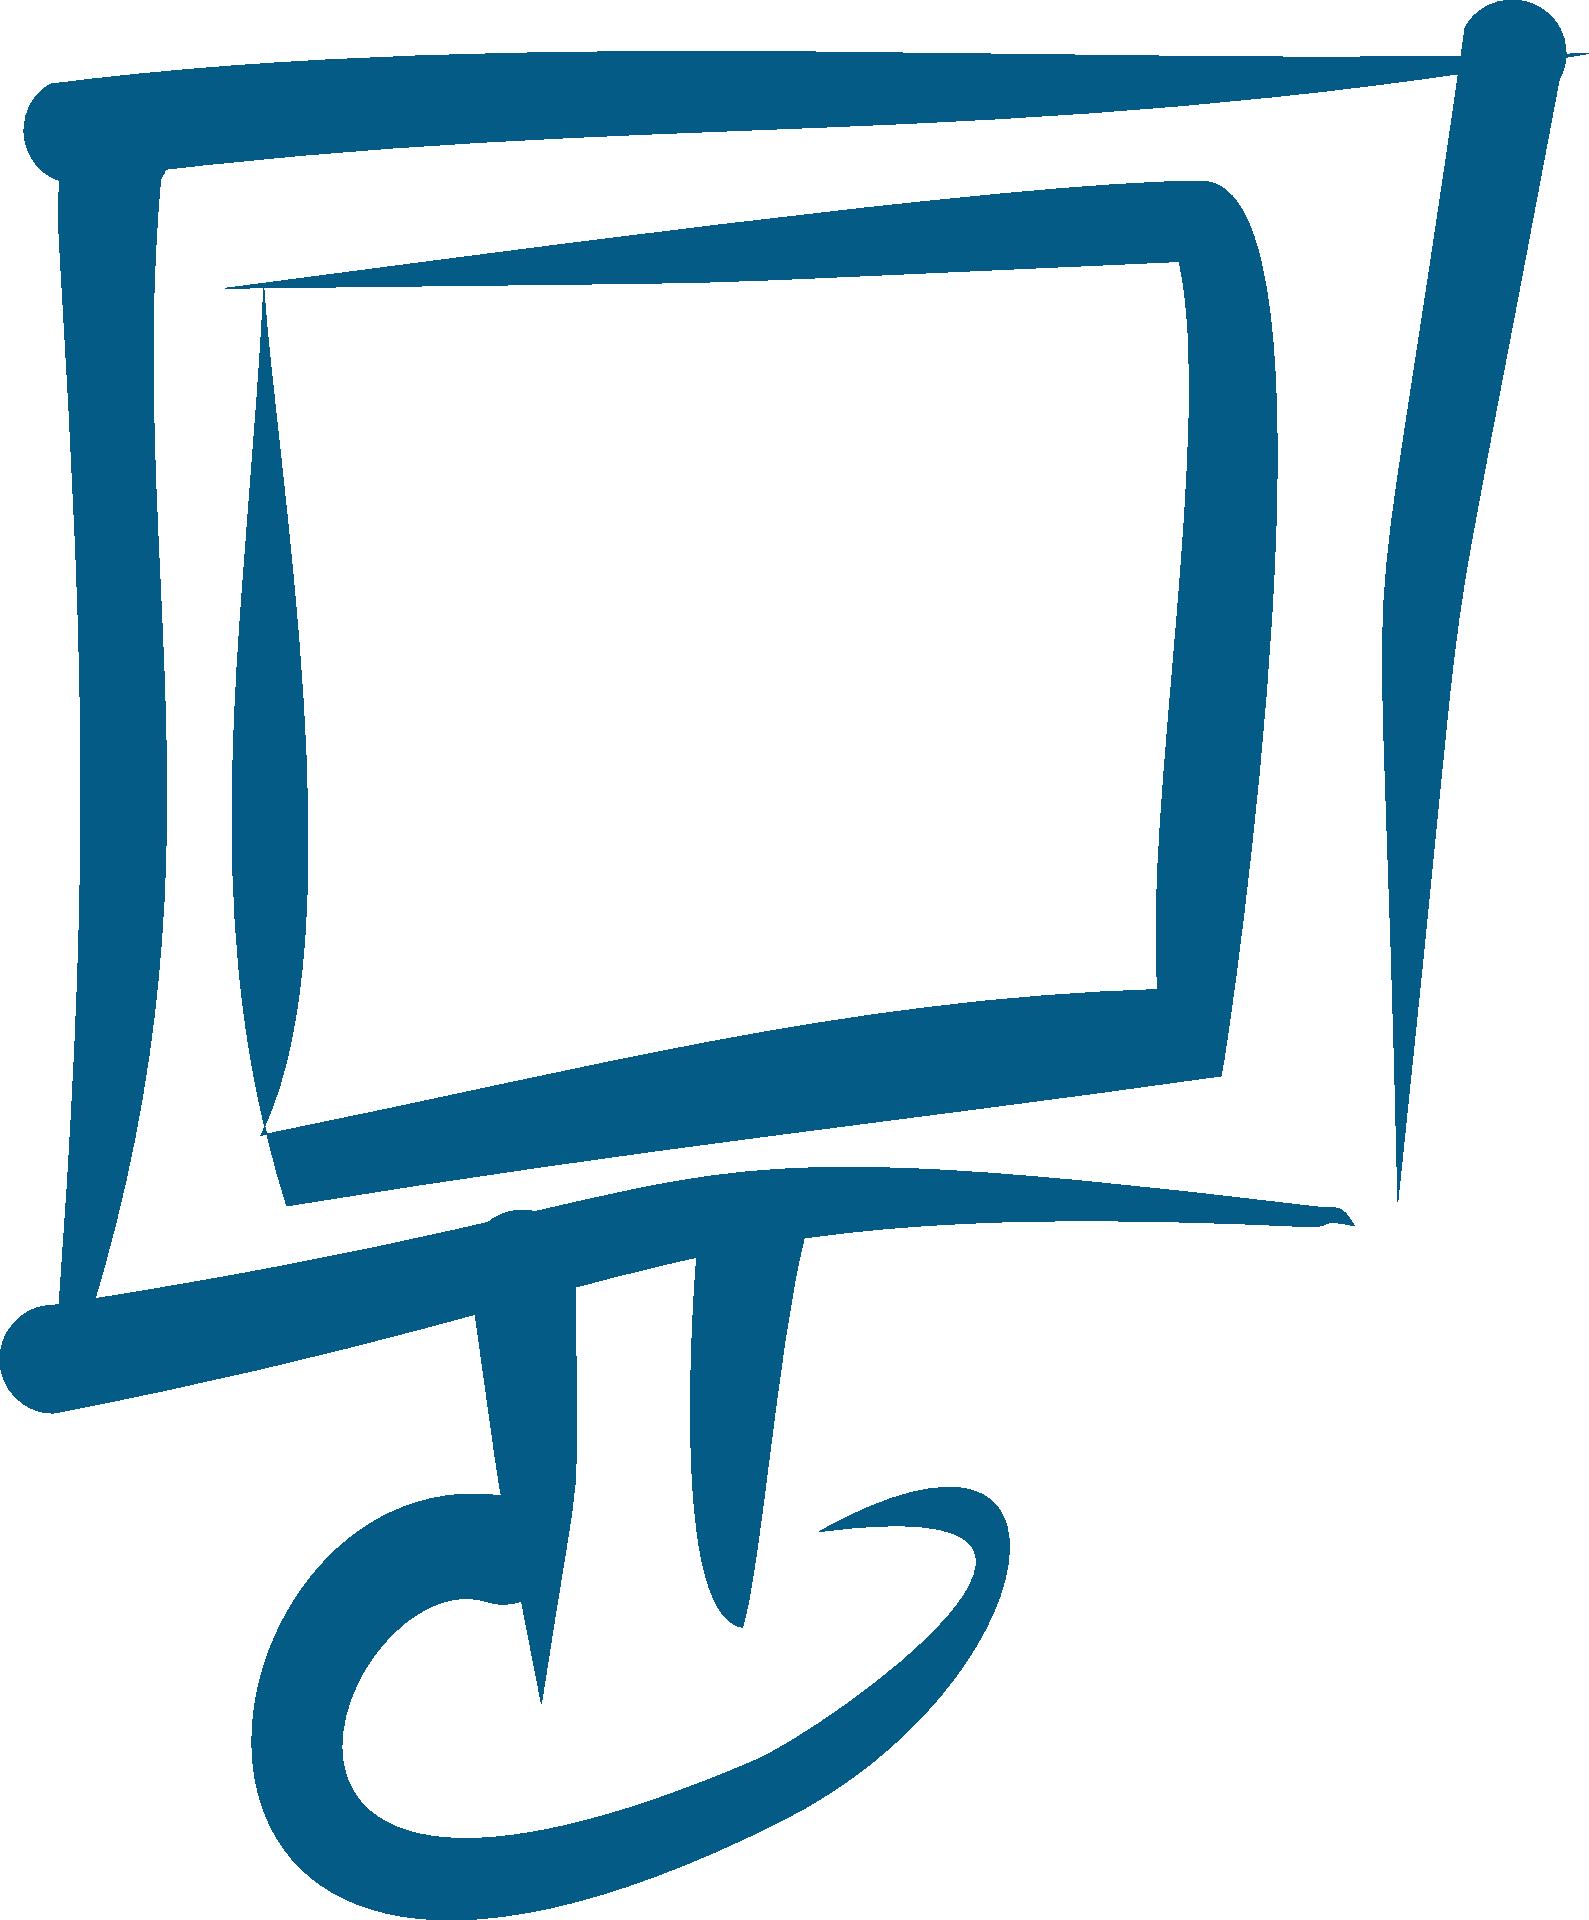 Book monitor clipart vector transparent download Computer Monitor Drawing at GetDrawings.com | Free for personal use ... vector transparent download